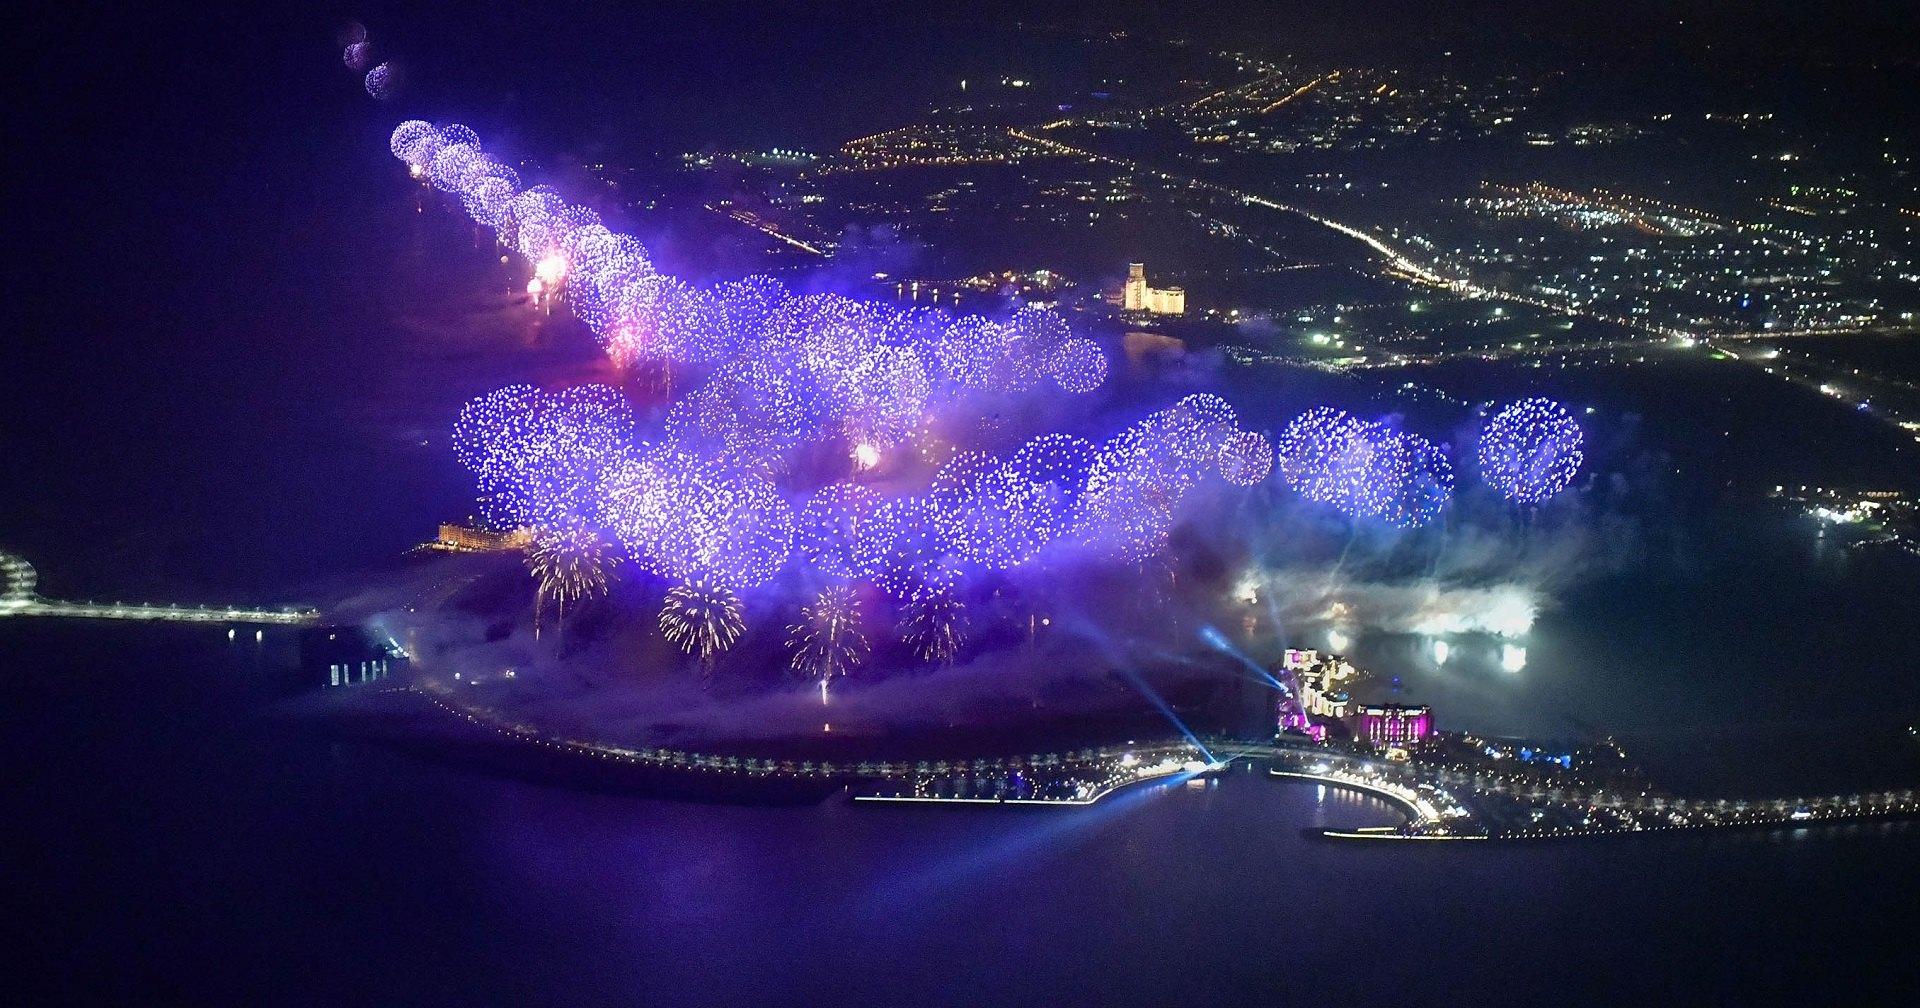 Дважды рекордный новогодний фейерверк: видео